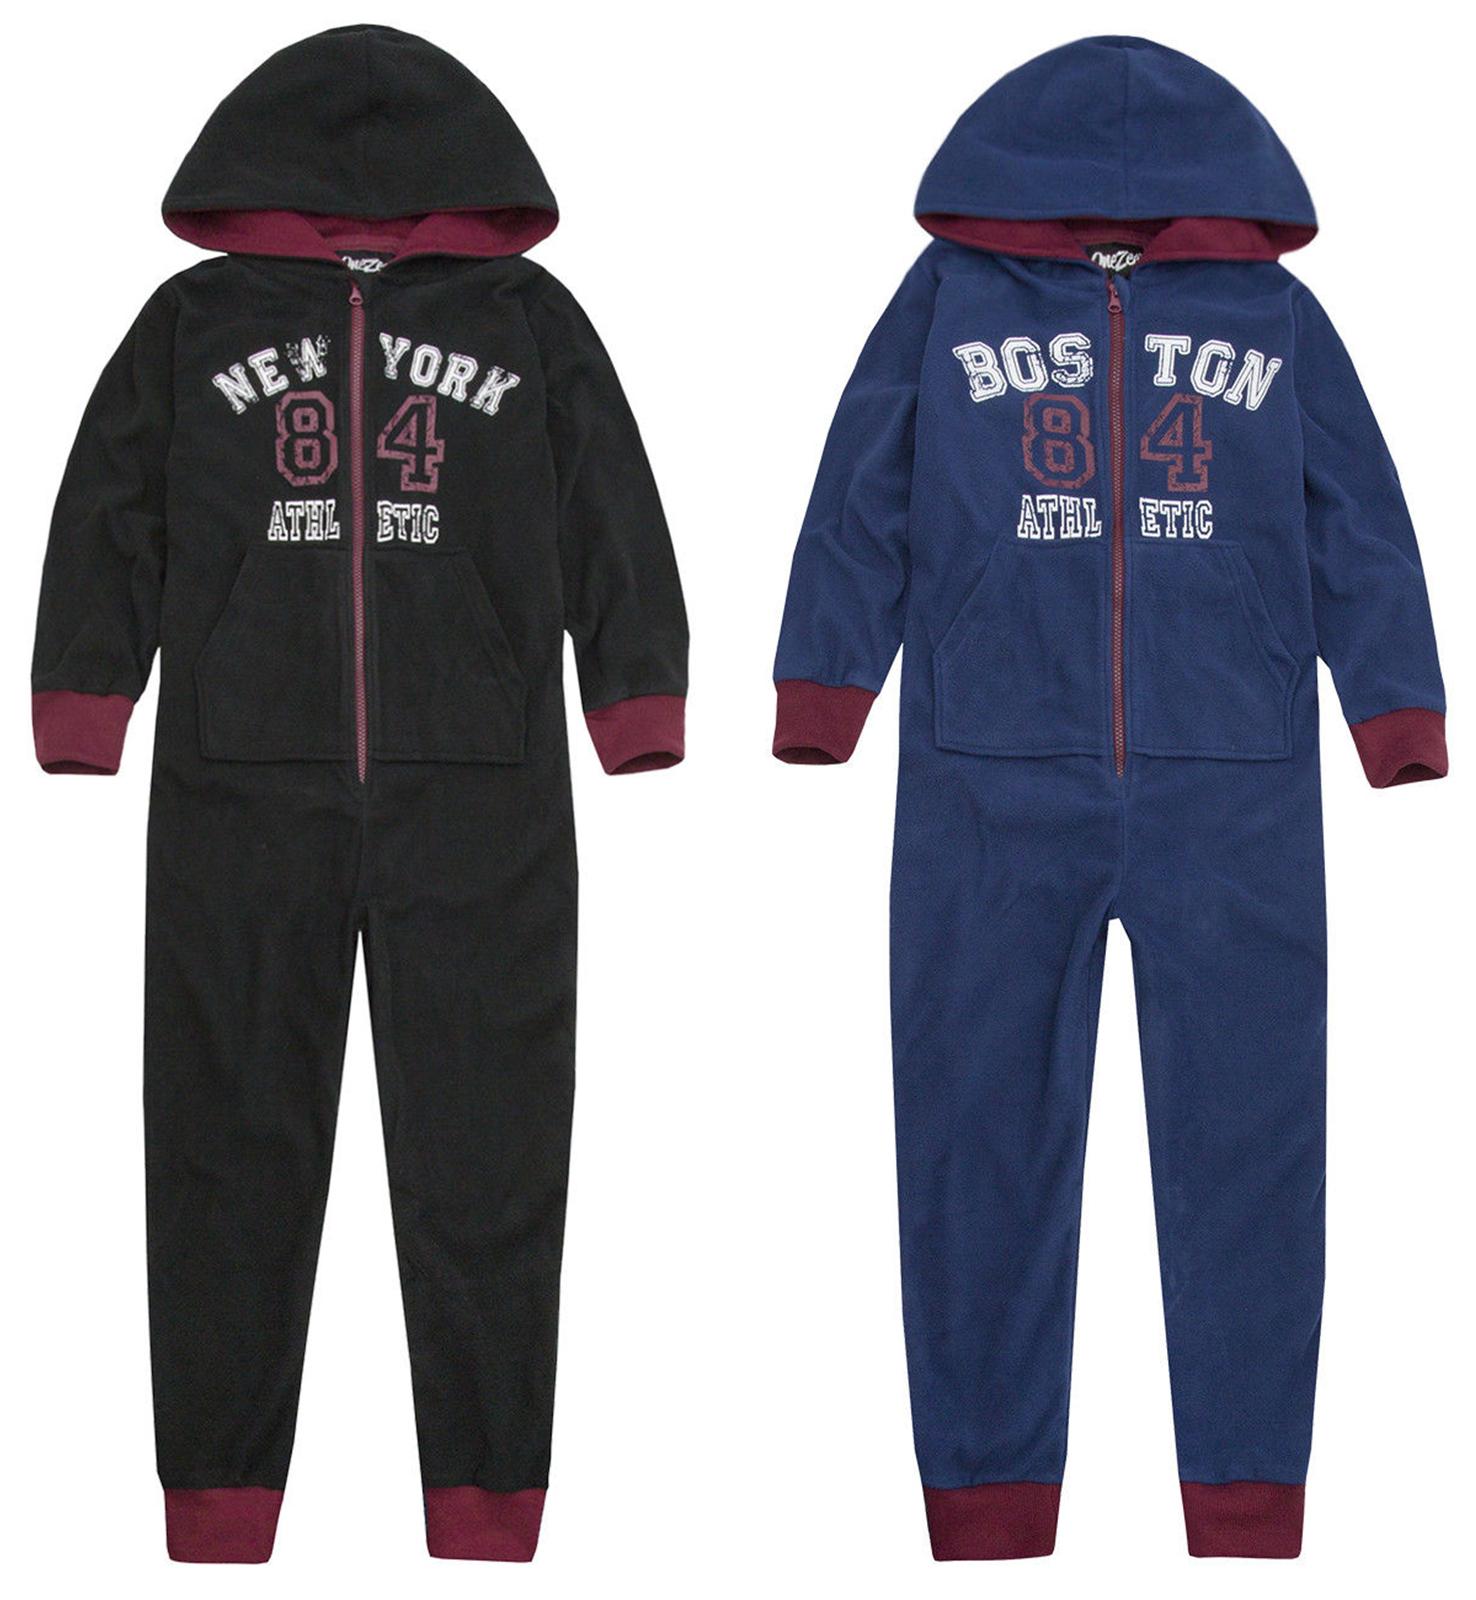 Boys 1Onesie1 Jumpsuit Pyjama New Kids Micro Fleece All In One Ages 7-13 Years